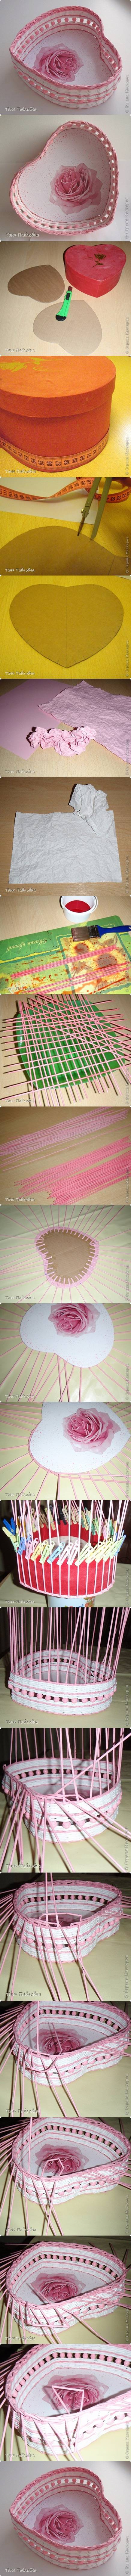 DIY Woven Paper Heart Shaped Basket 2